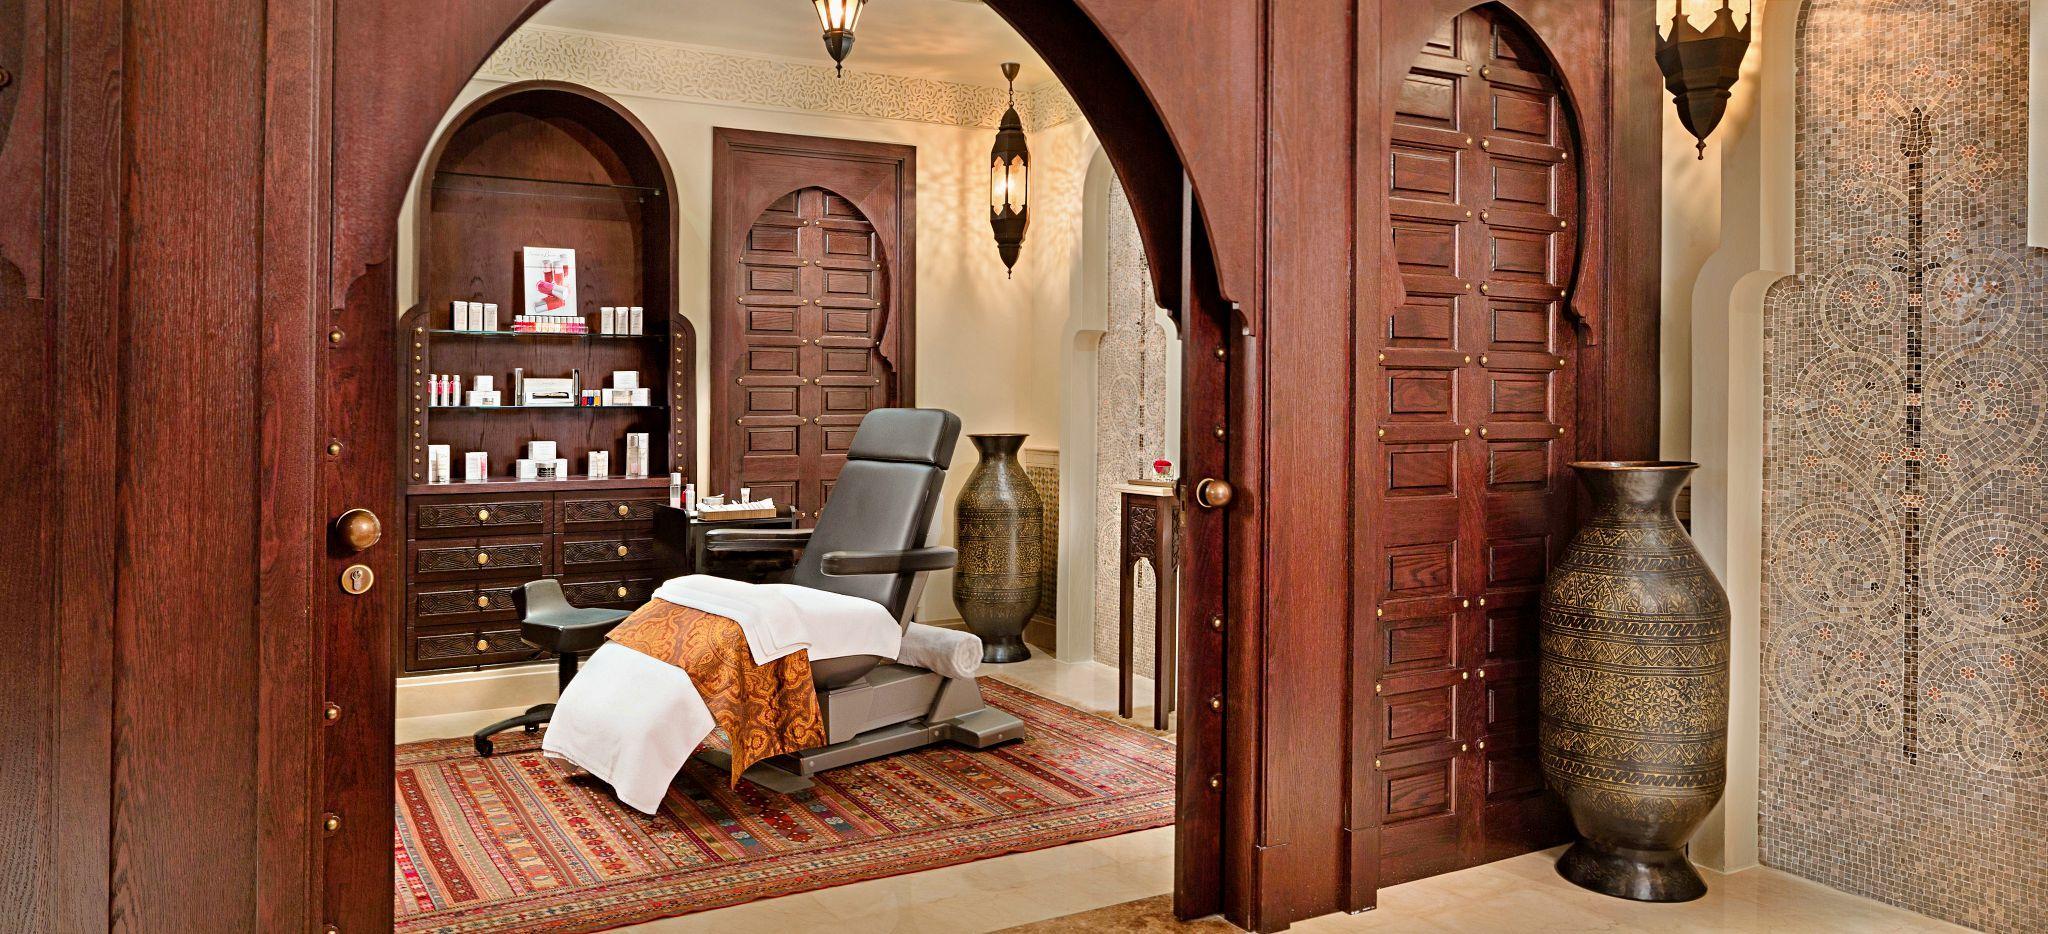 Wellness Behandlungsraum im Hamam des Emirates Palace Abu Dhabi